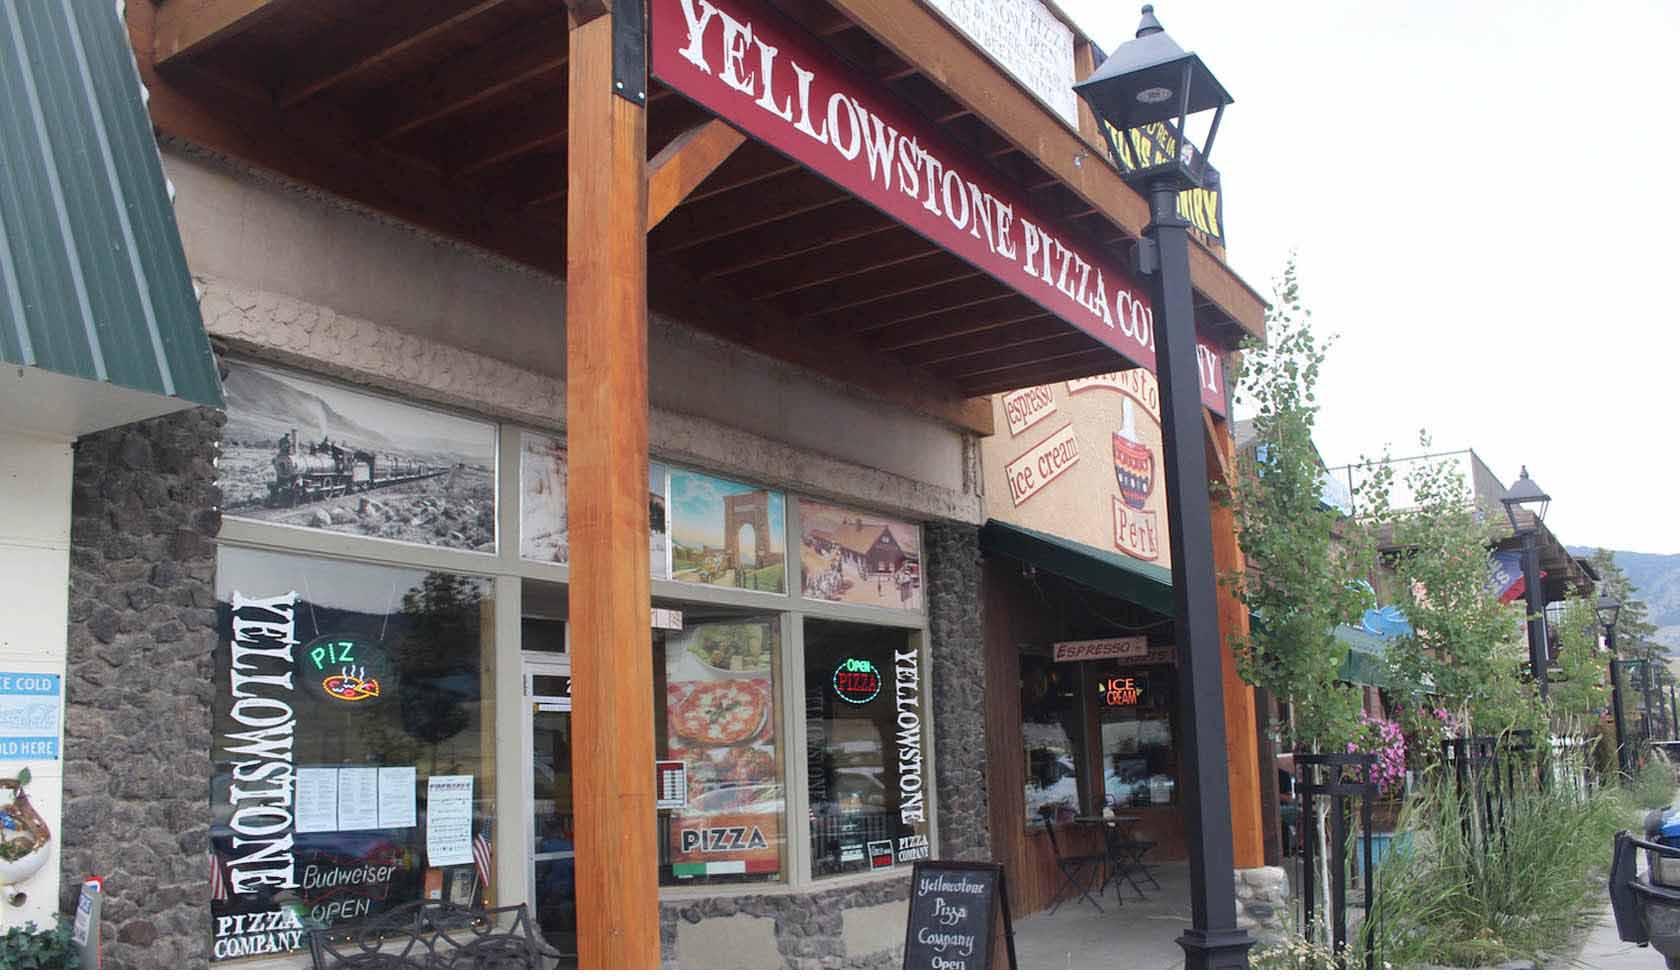 Yellowstone Pizza Company profile image